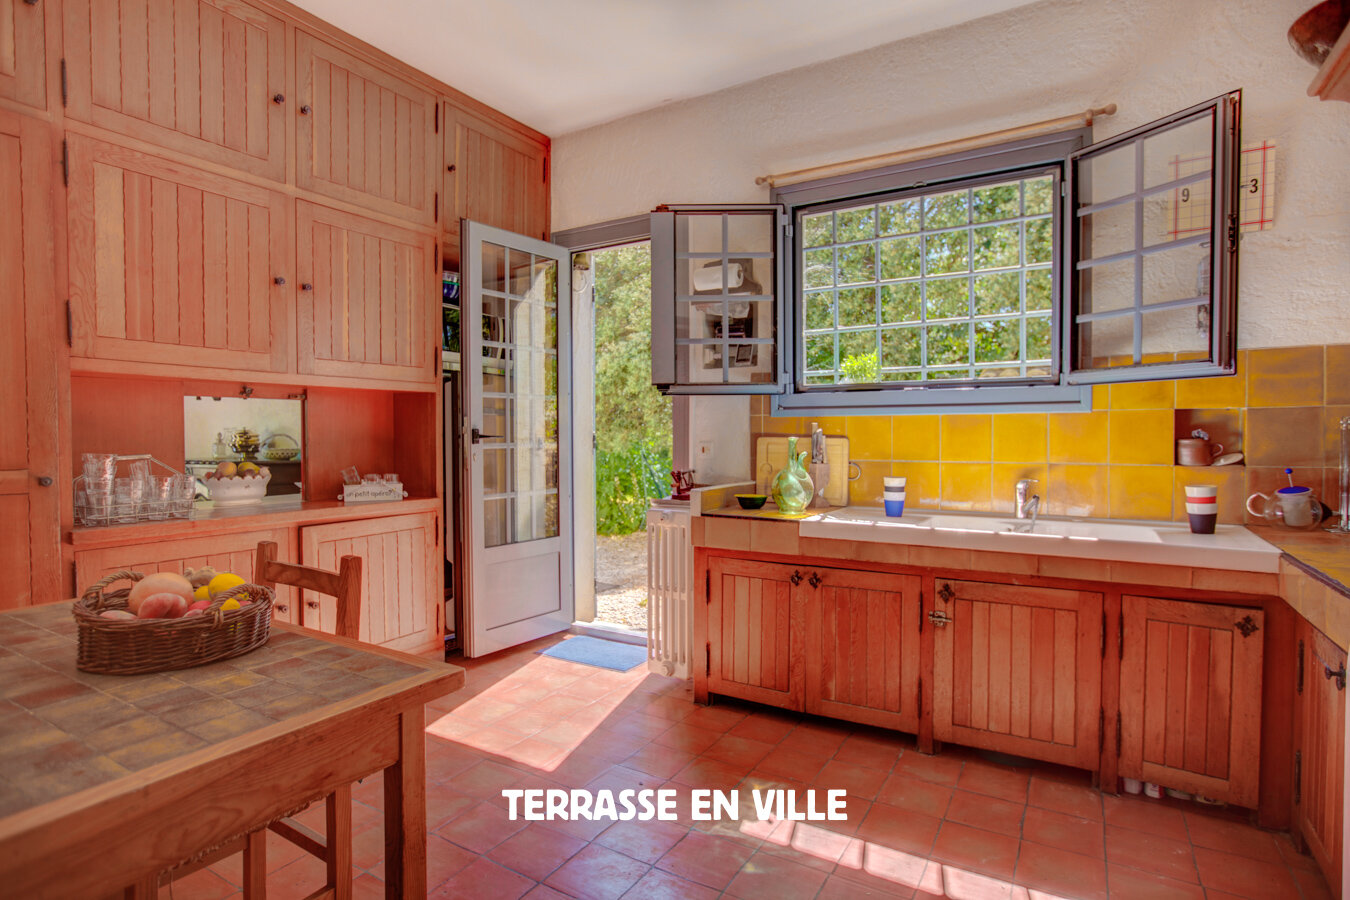 TERRASSE EN VILLE MARSEILLE-14.jpg